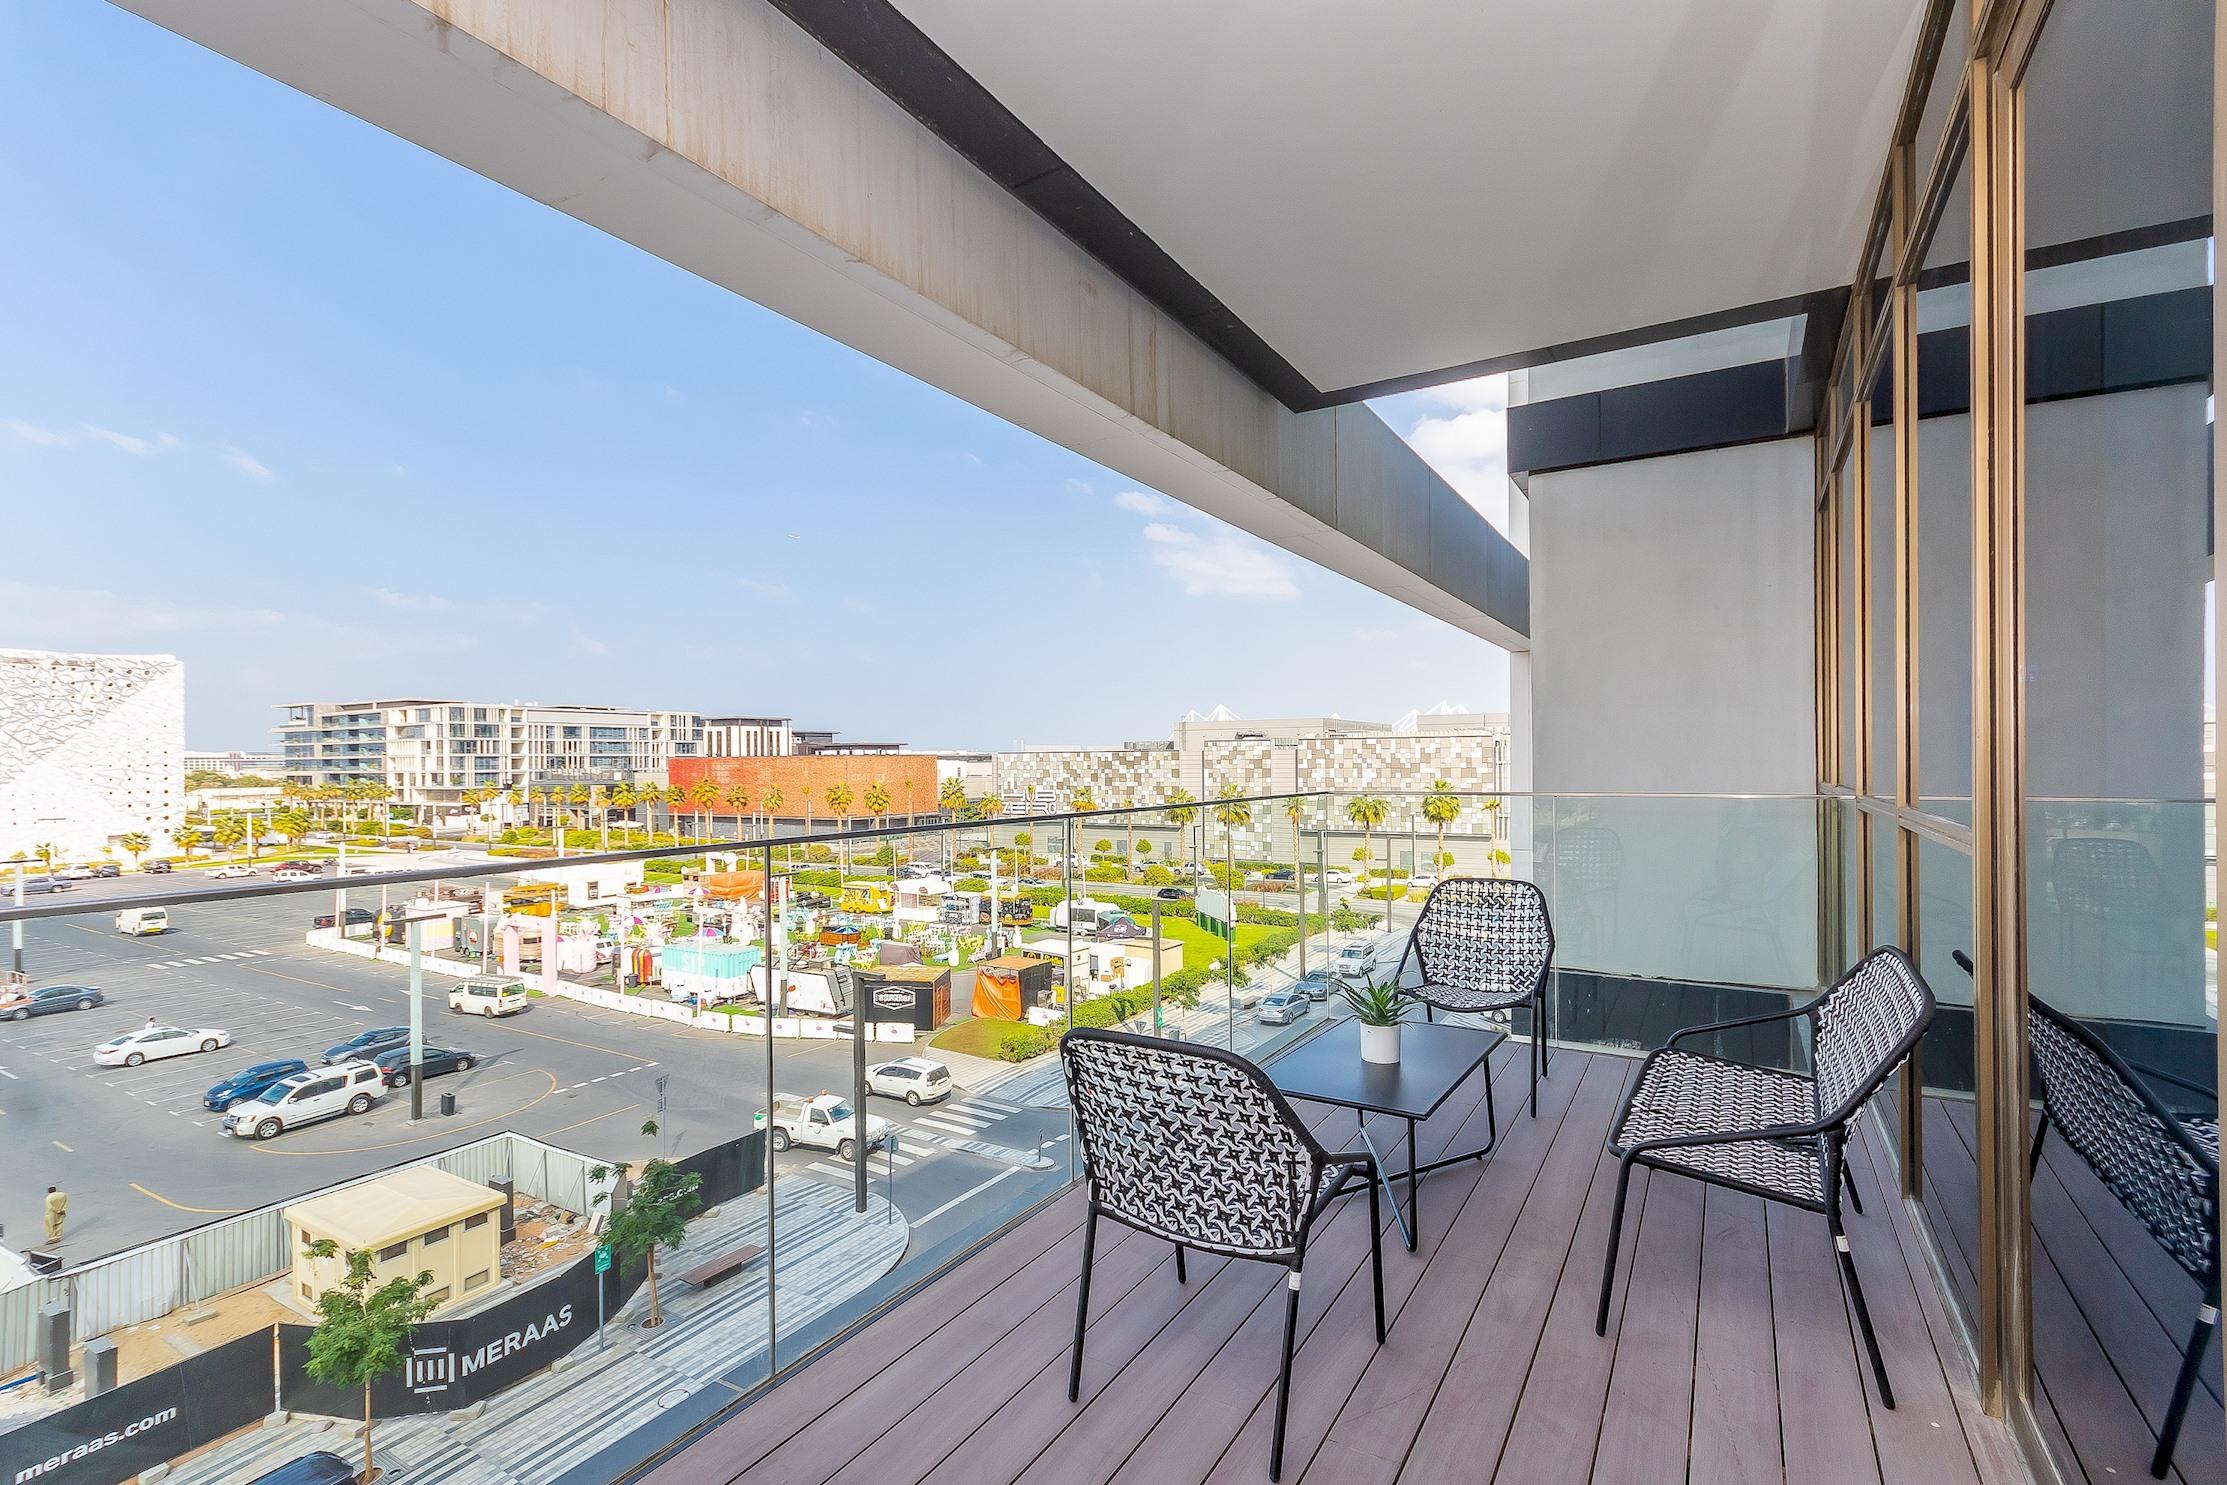 Remarkable Value + Unbeatable Location, 3 Beds City Walk B'10 309 photo 24142301